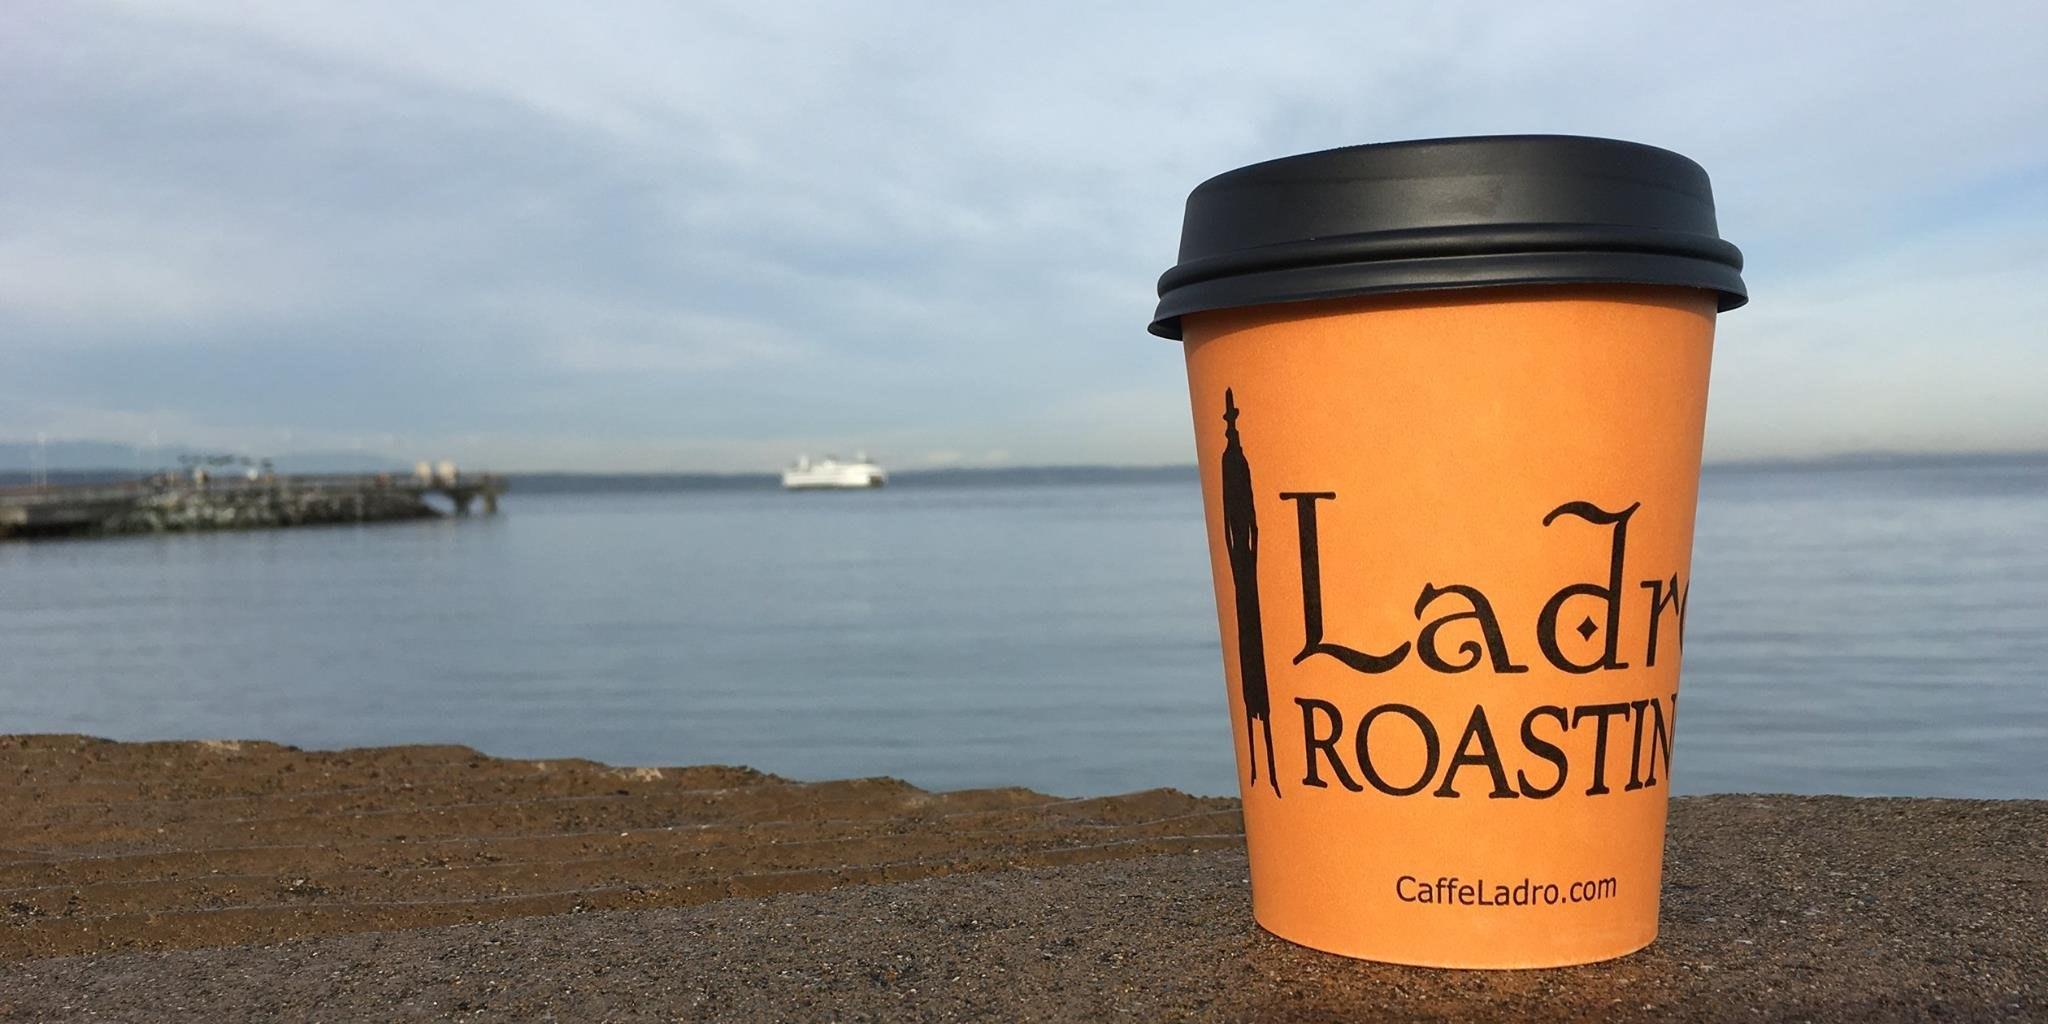 Caffee Ladro